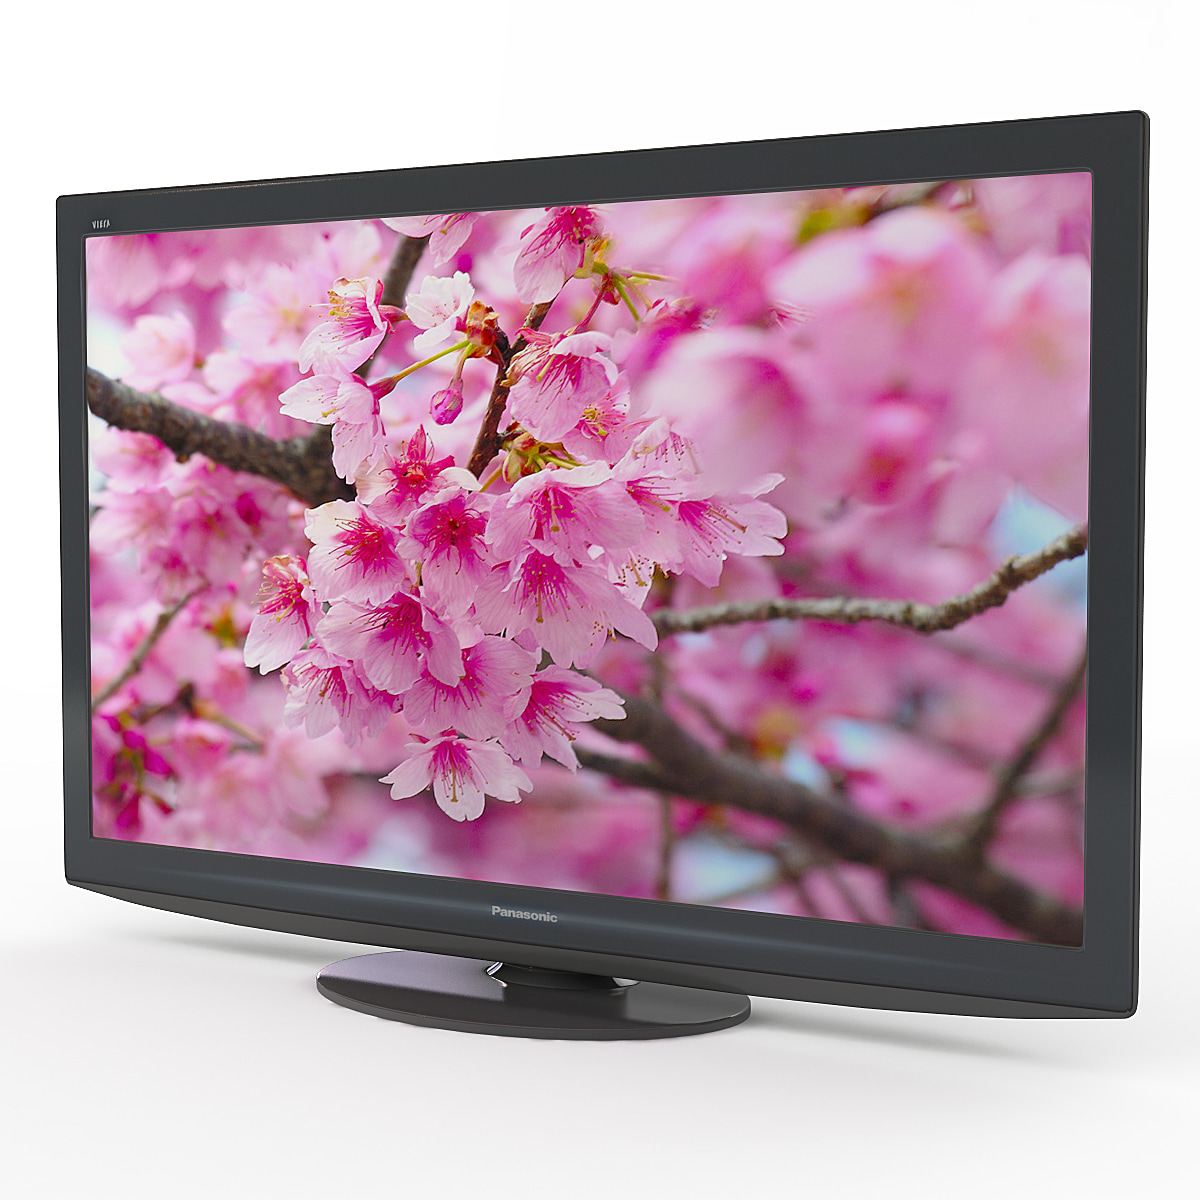 TV_Panasonic_VIERA_TX-PR42G20_00.jpg